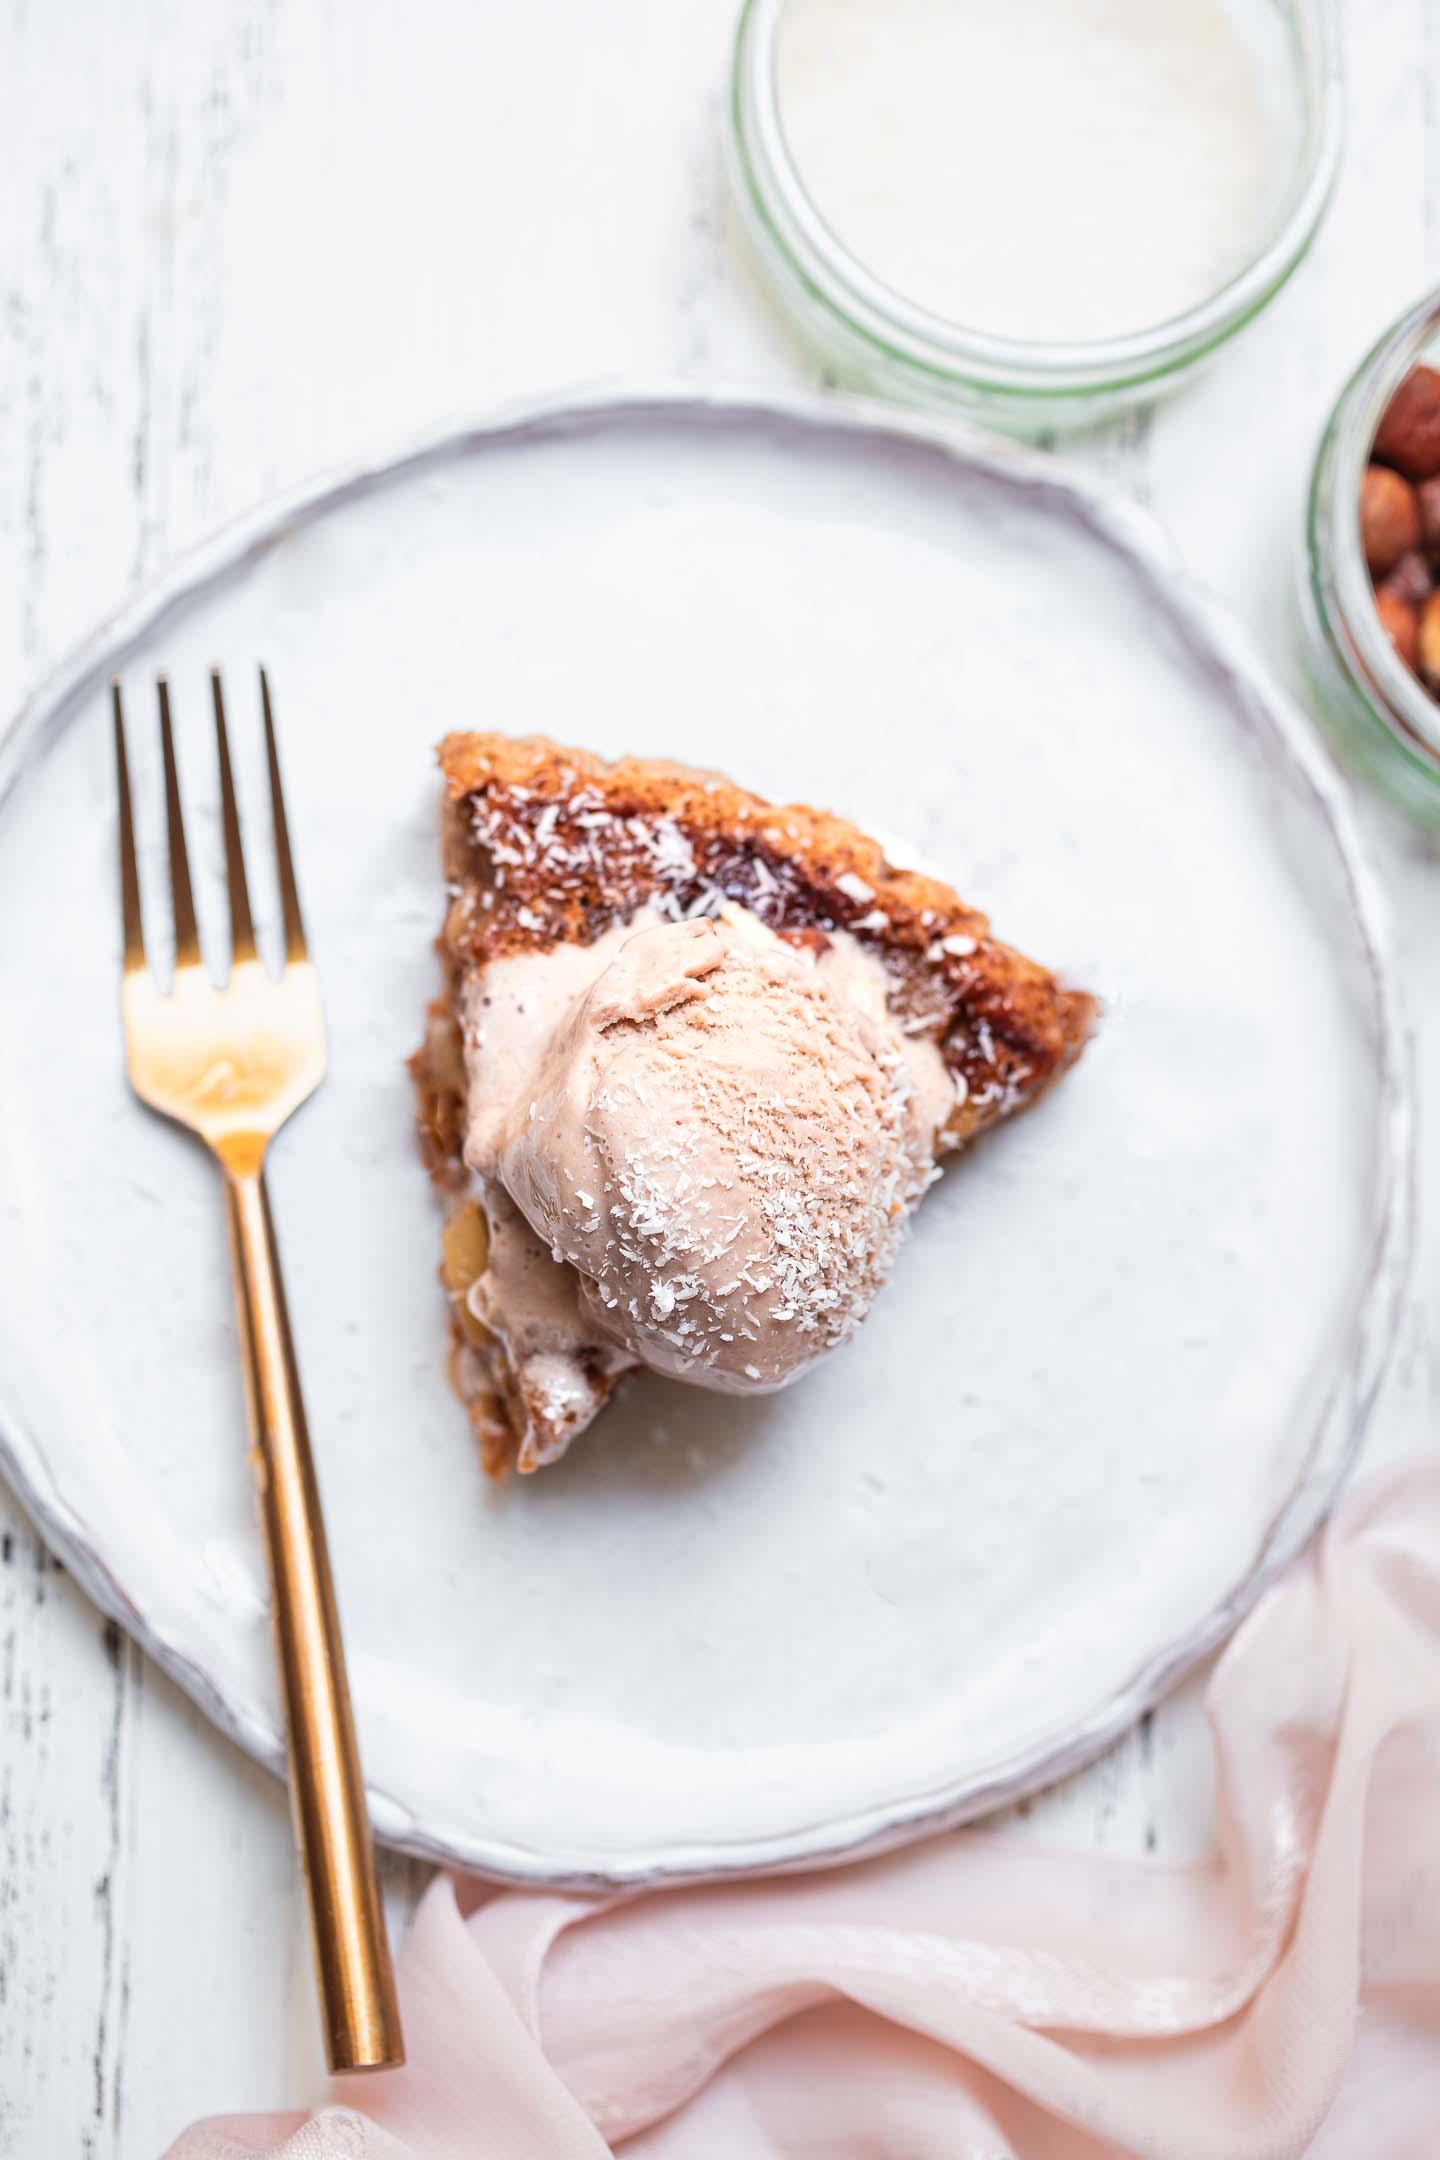 Gluten-free vegan cake slice with dairy-free ice cream on a plate